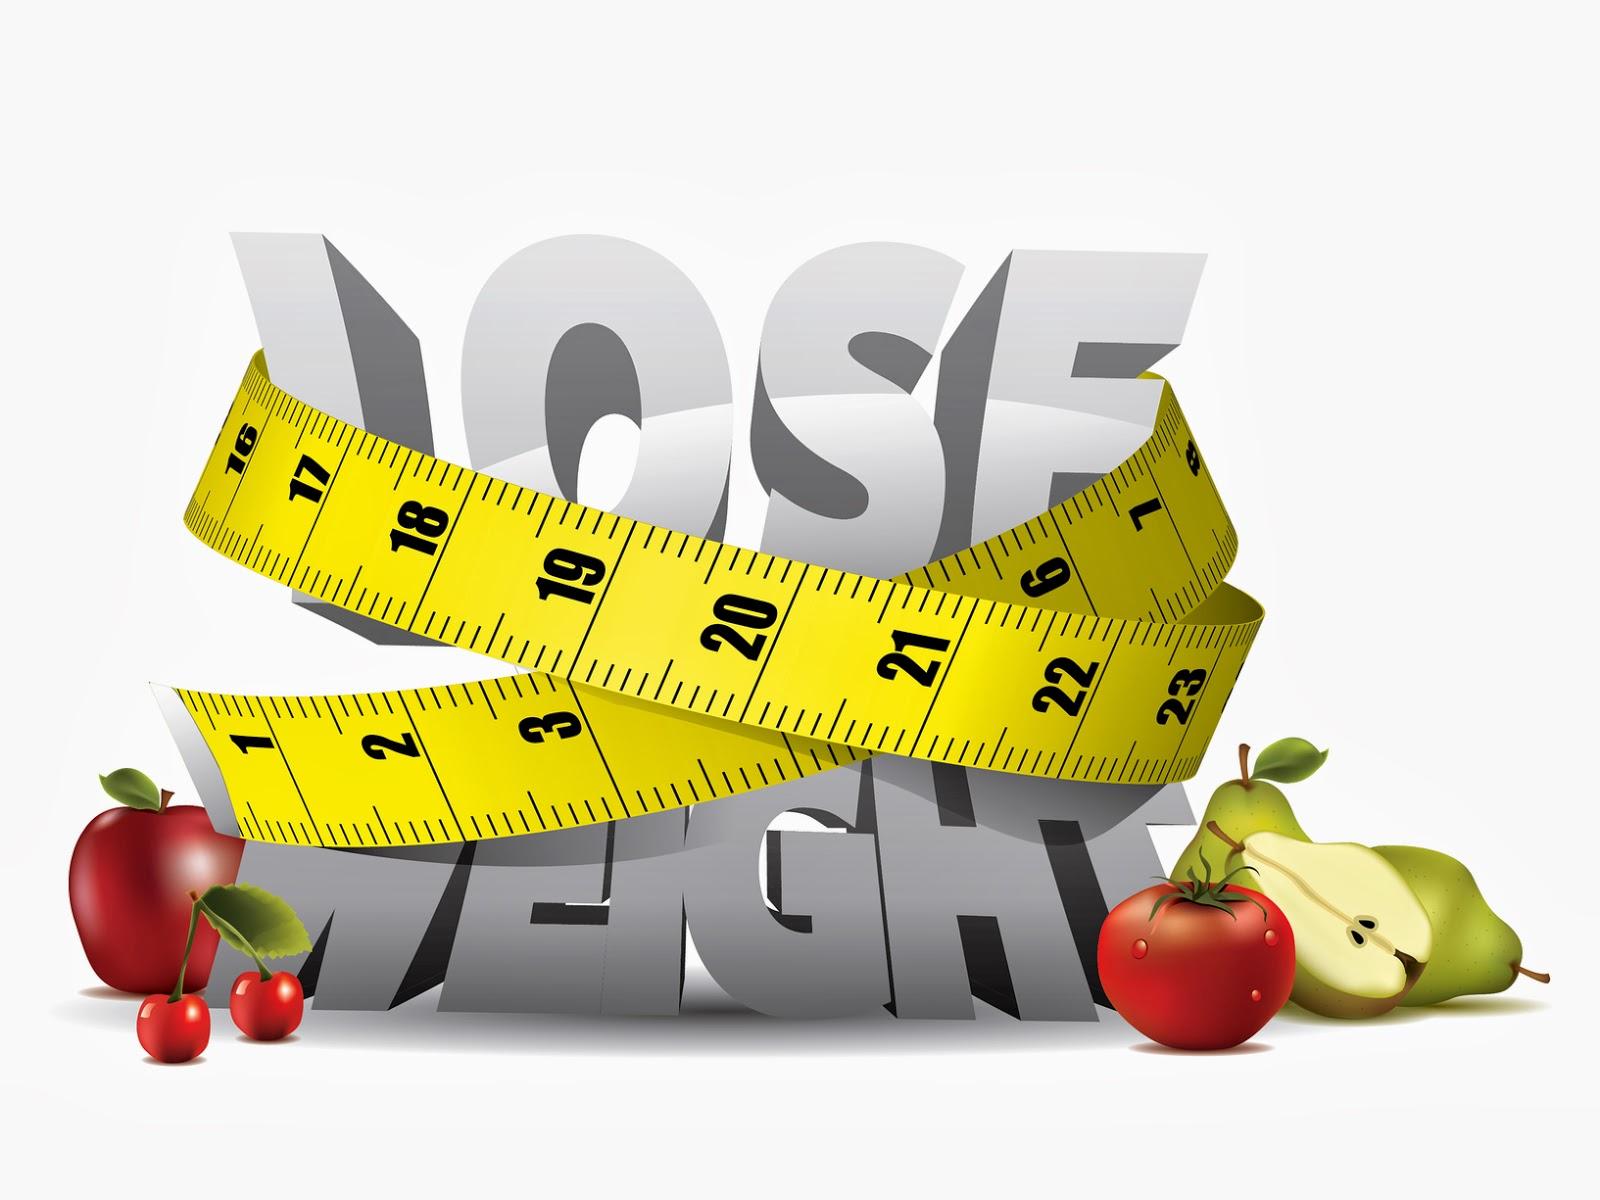 Kenapa Sudah Rutin Minum Herbalife Tapi Berat Badan Tidak Turun?